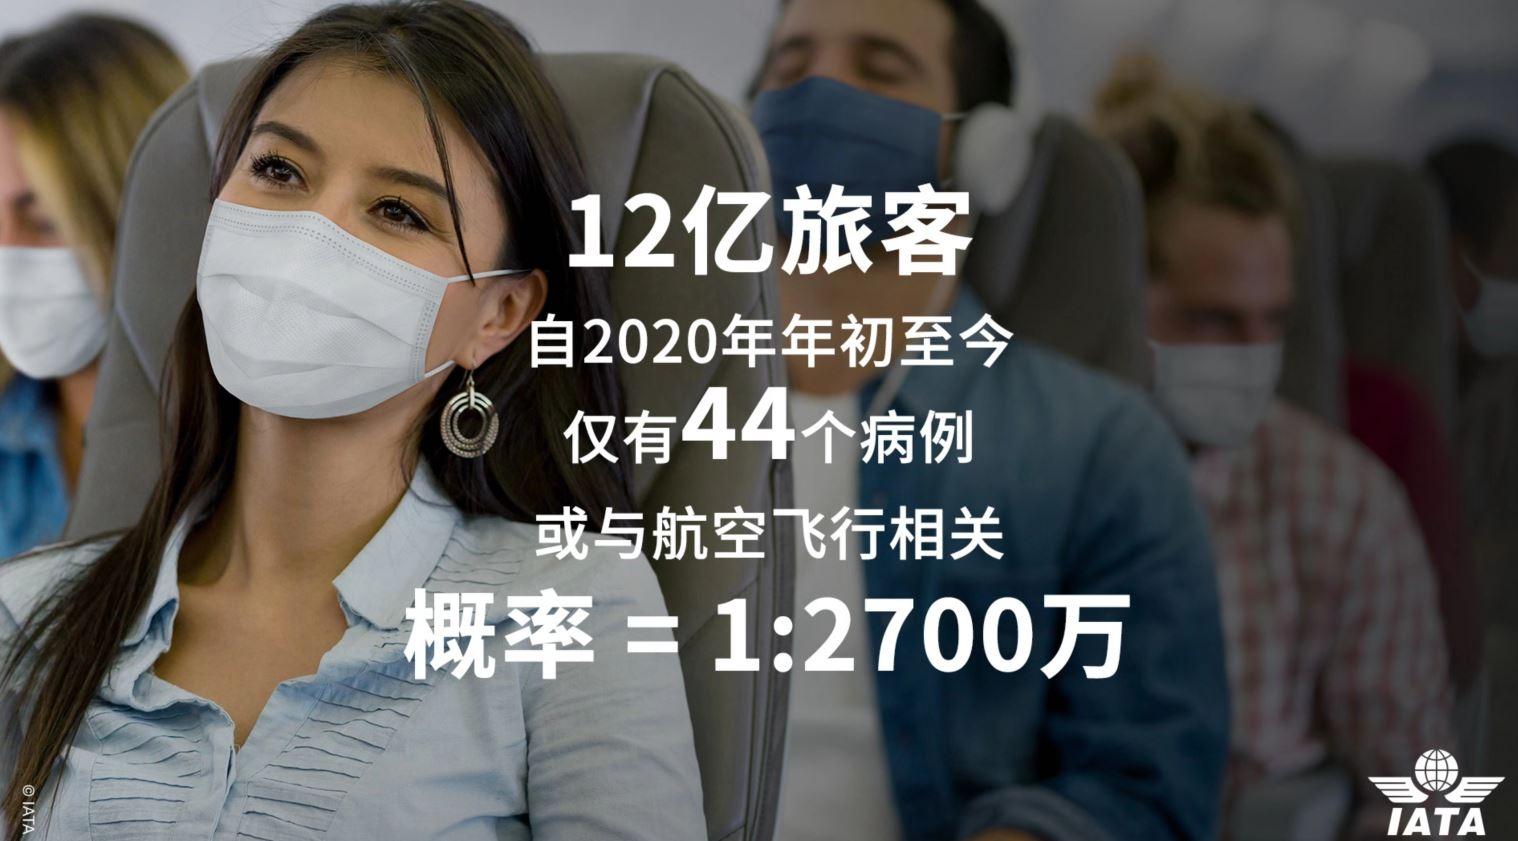 图源:IATA